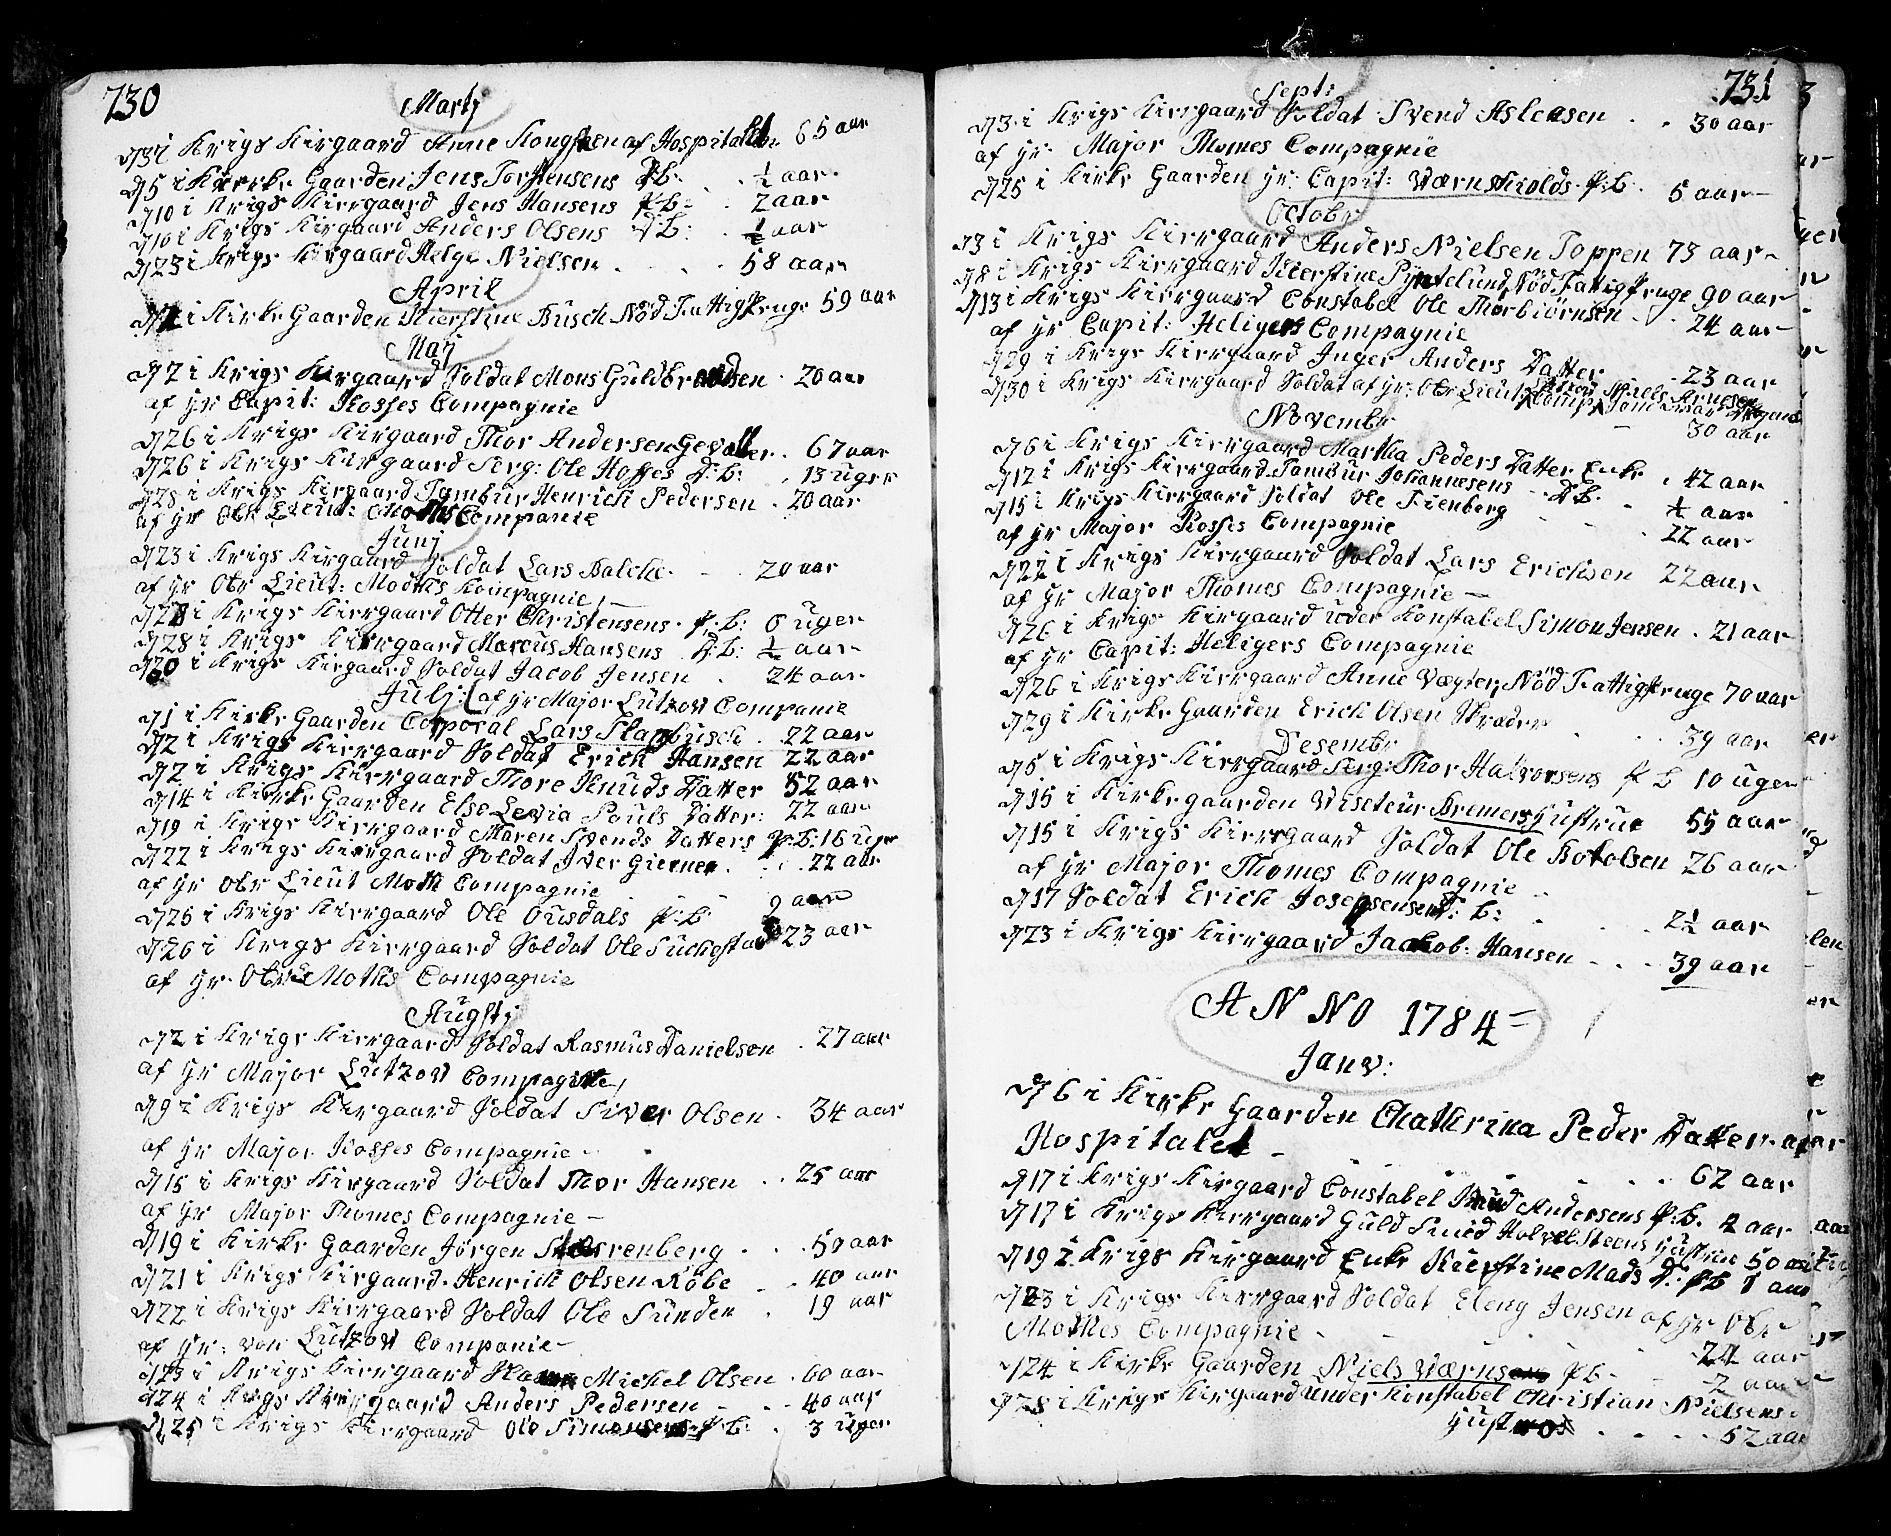 SAO, Fredrikstad prestekontor Kirkebøker, F/Fa/L0002: Ministerialbok nr. 2, 1750-1804, s. 730-731